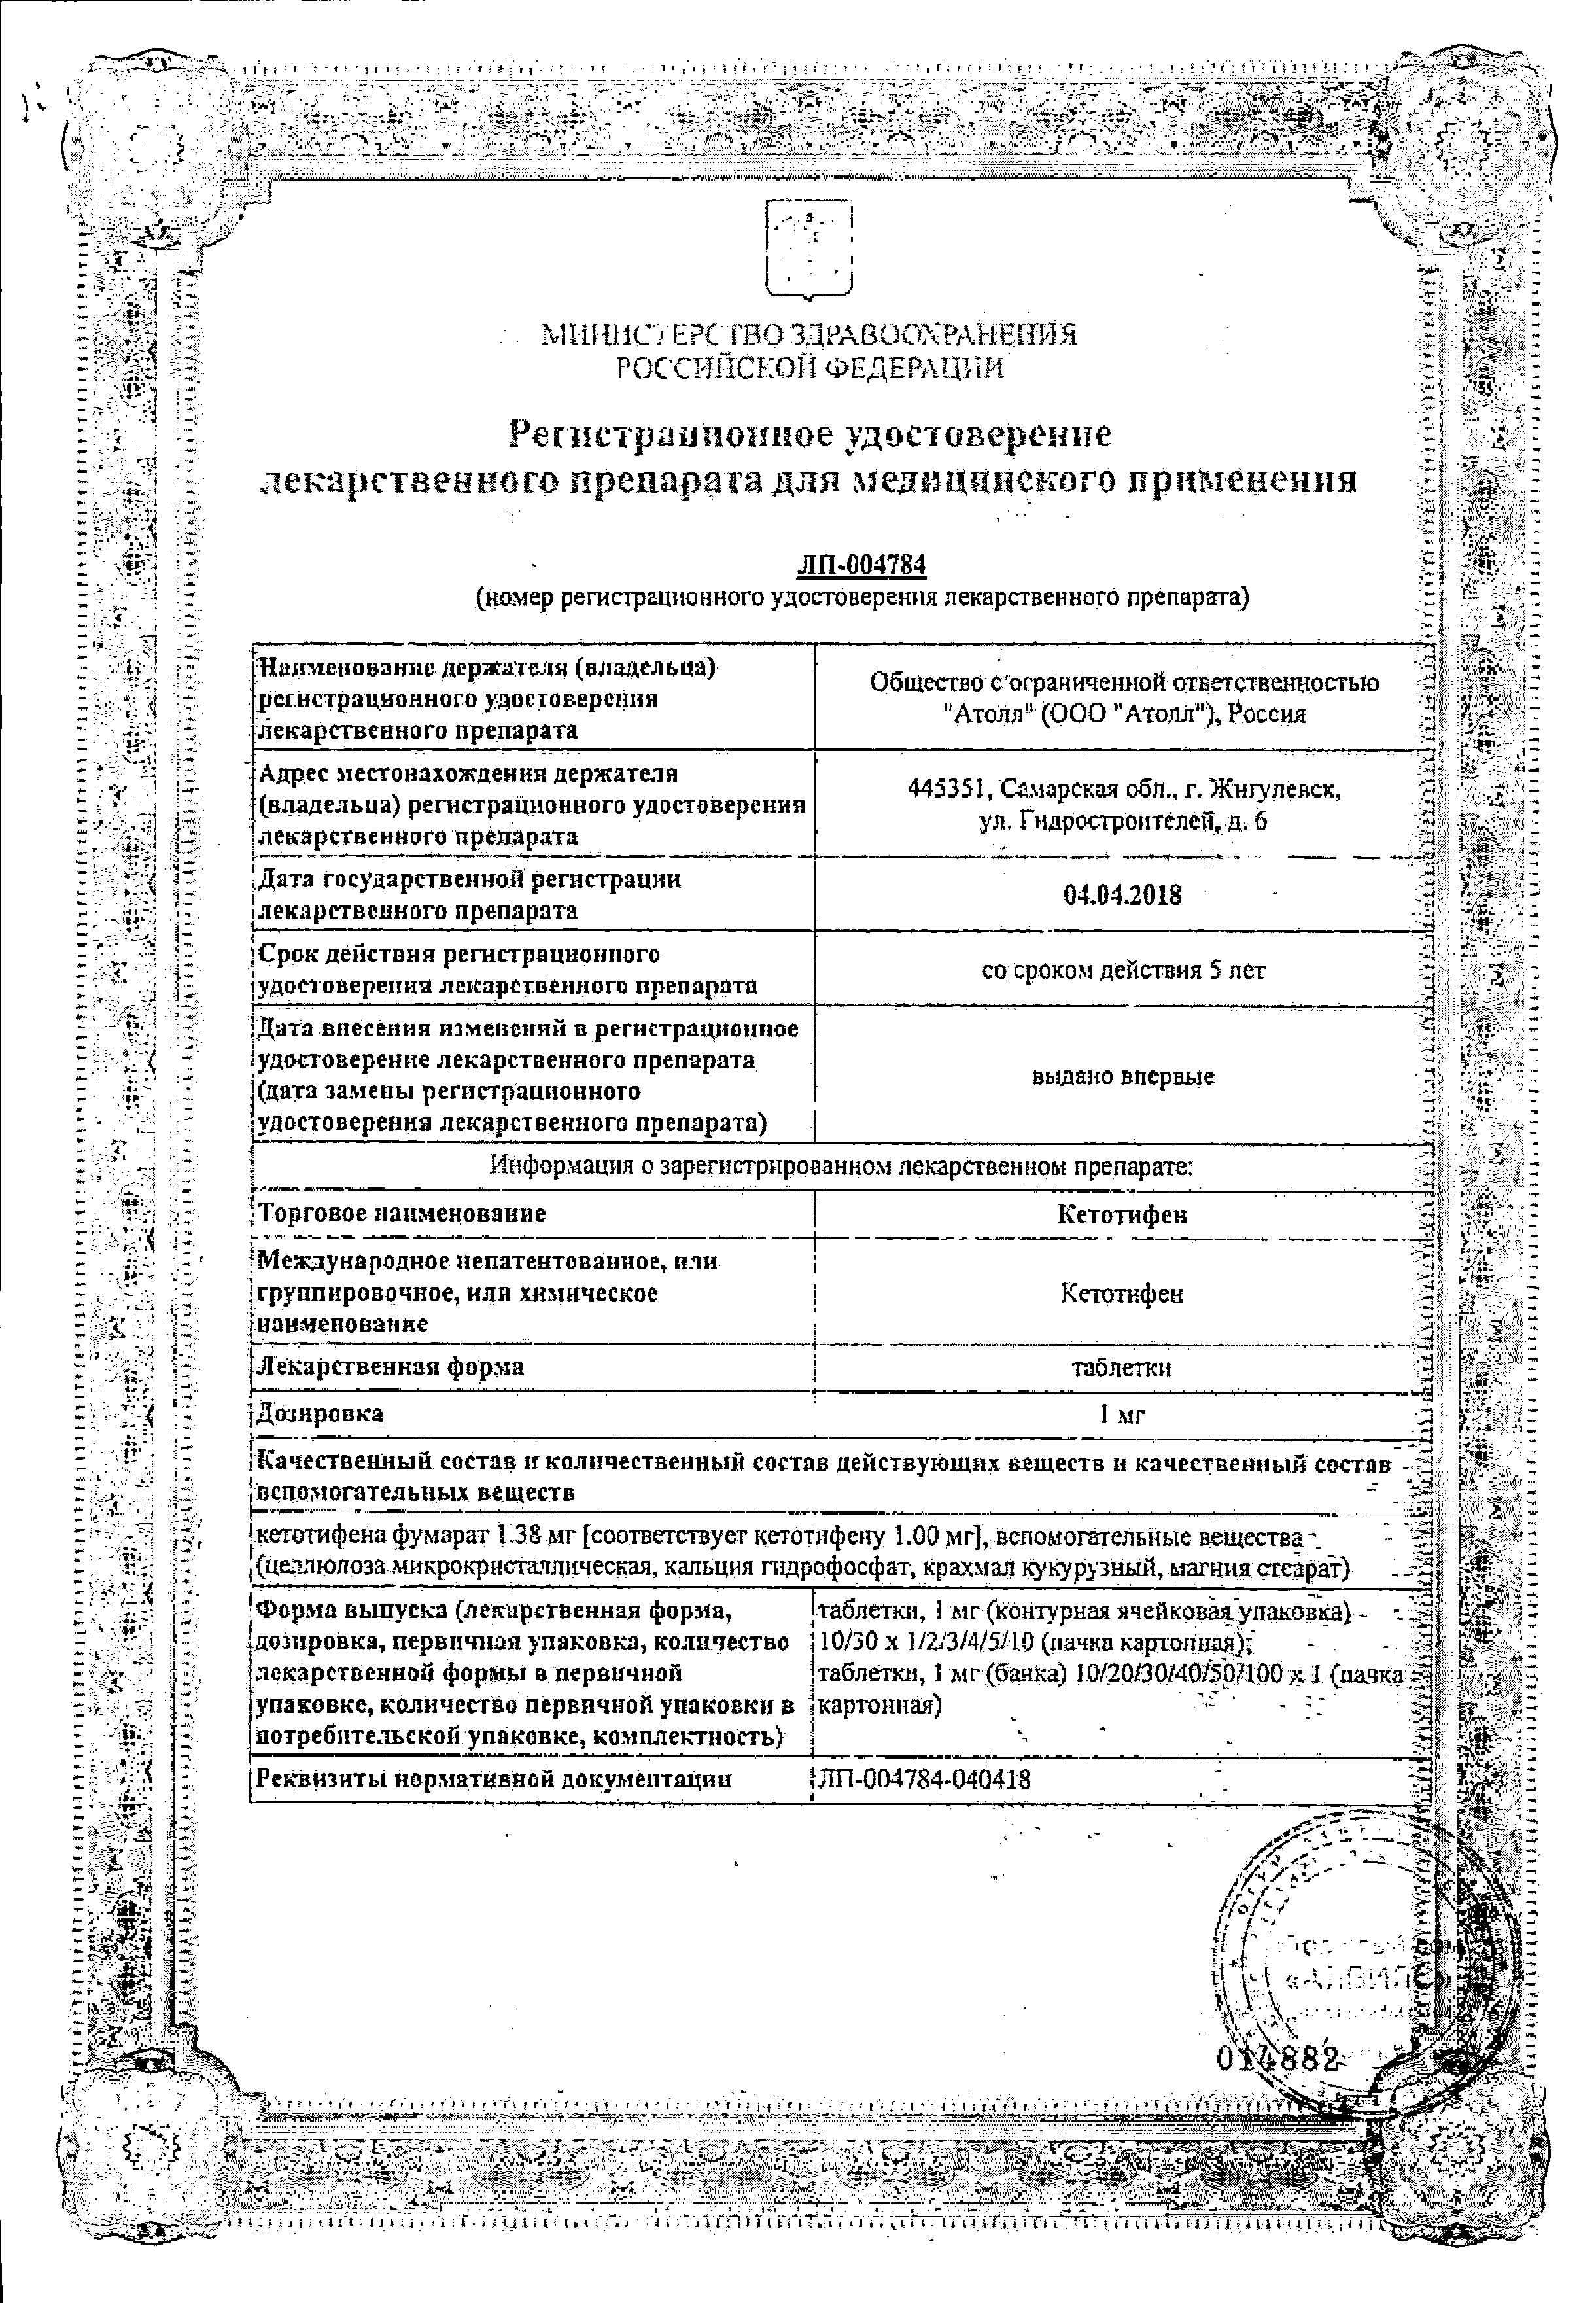 Кетотифен сертификат